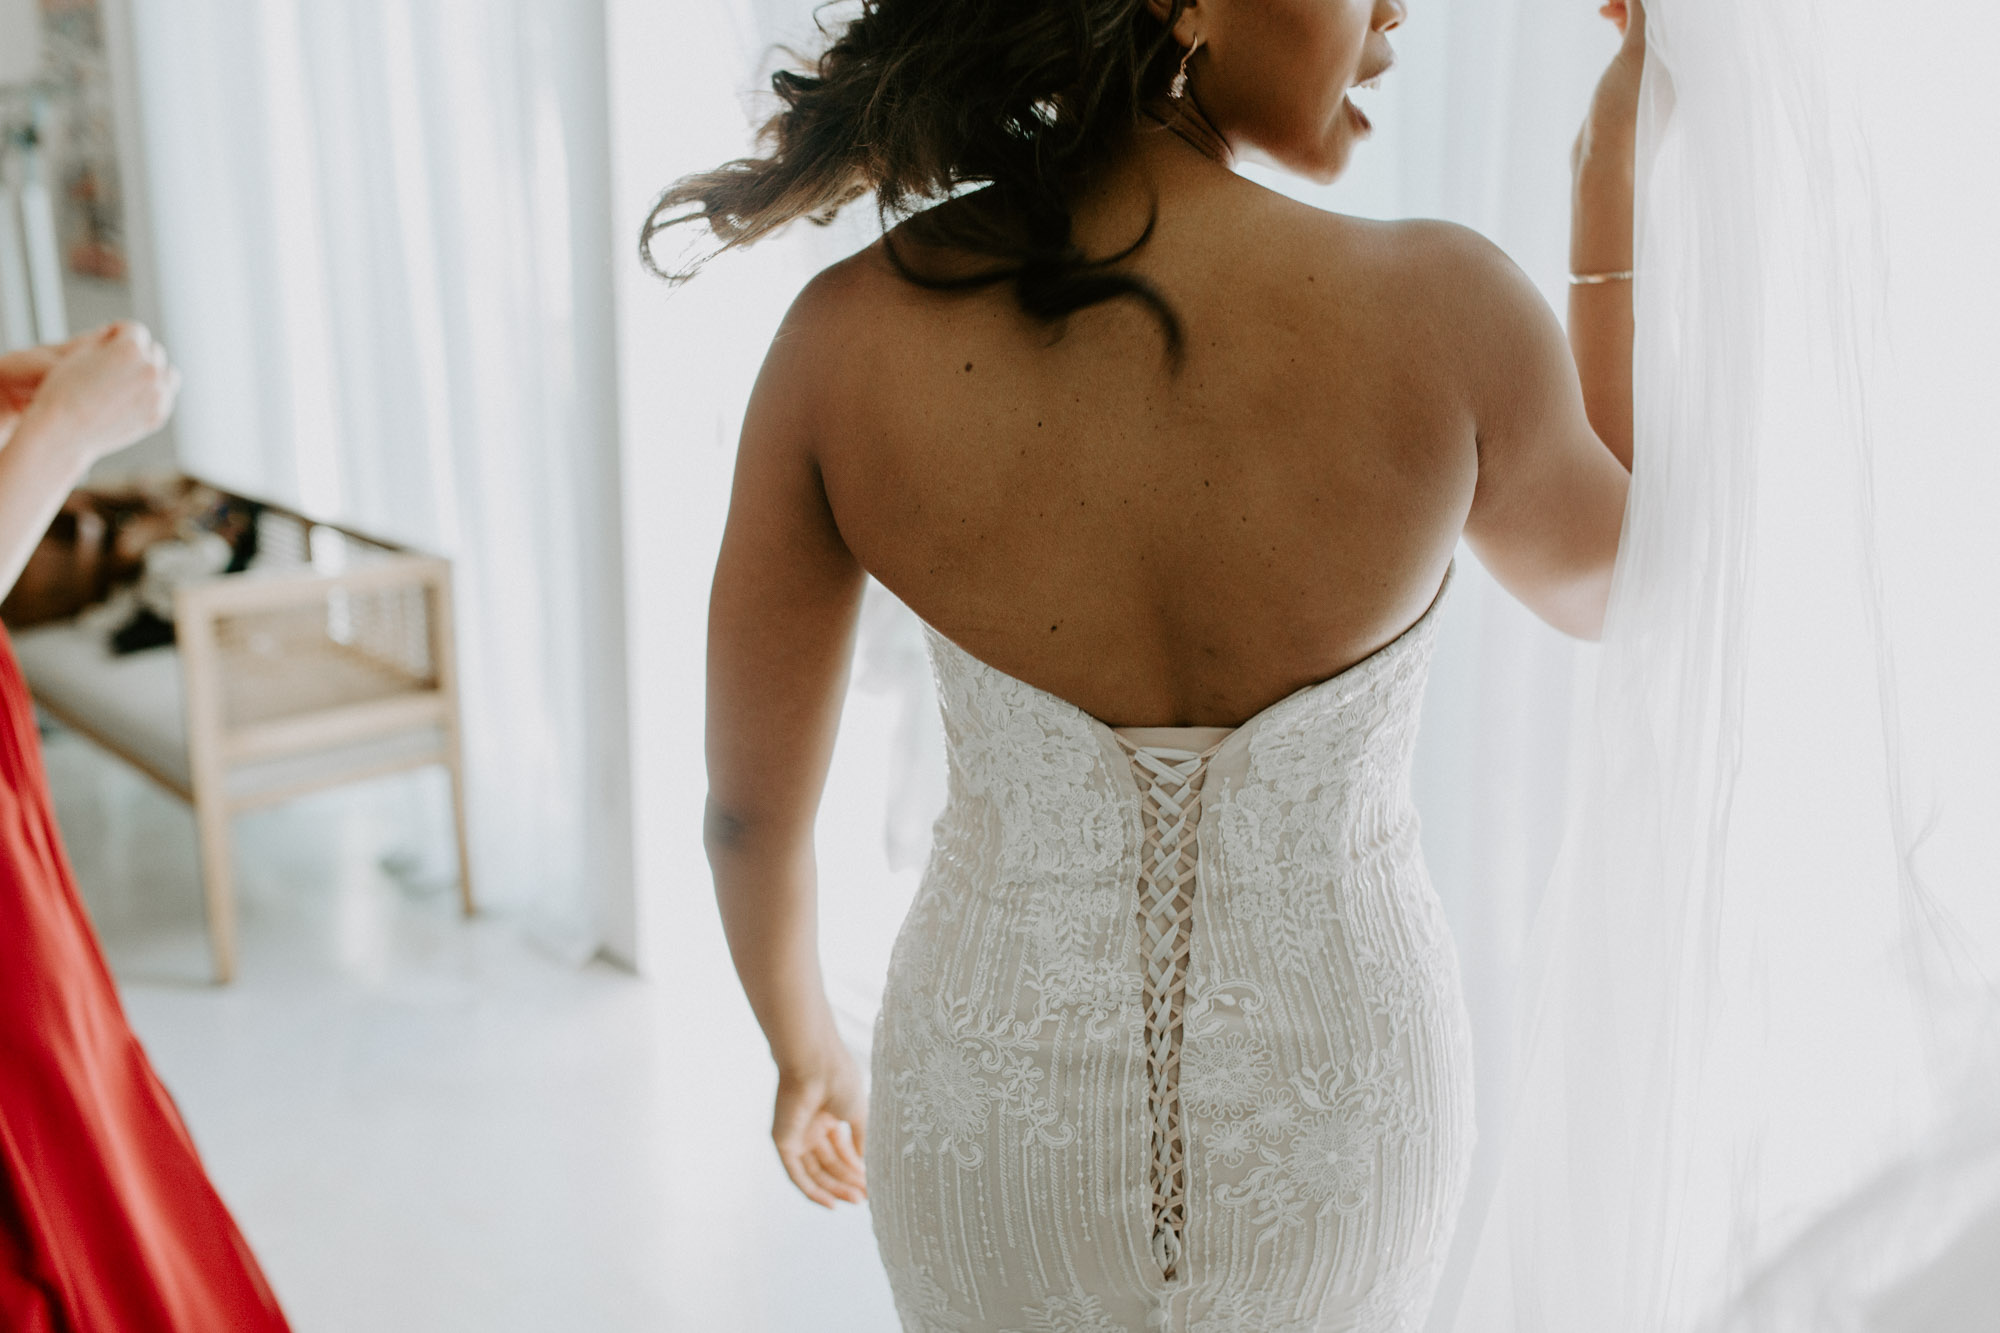 prairie_glass_house_wedding_champaign_wright_photographs_simon_0017.jpg